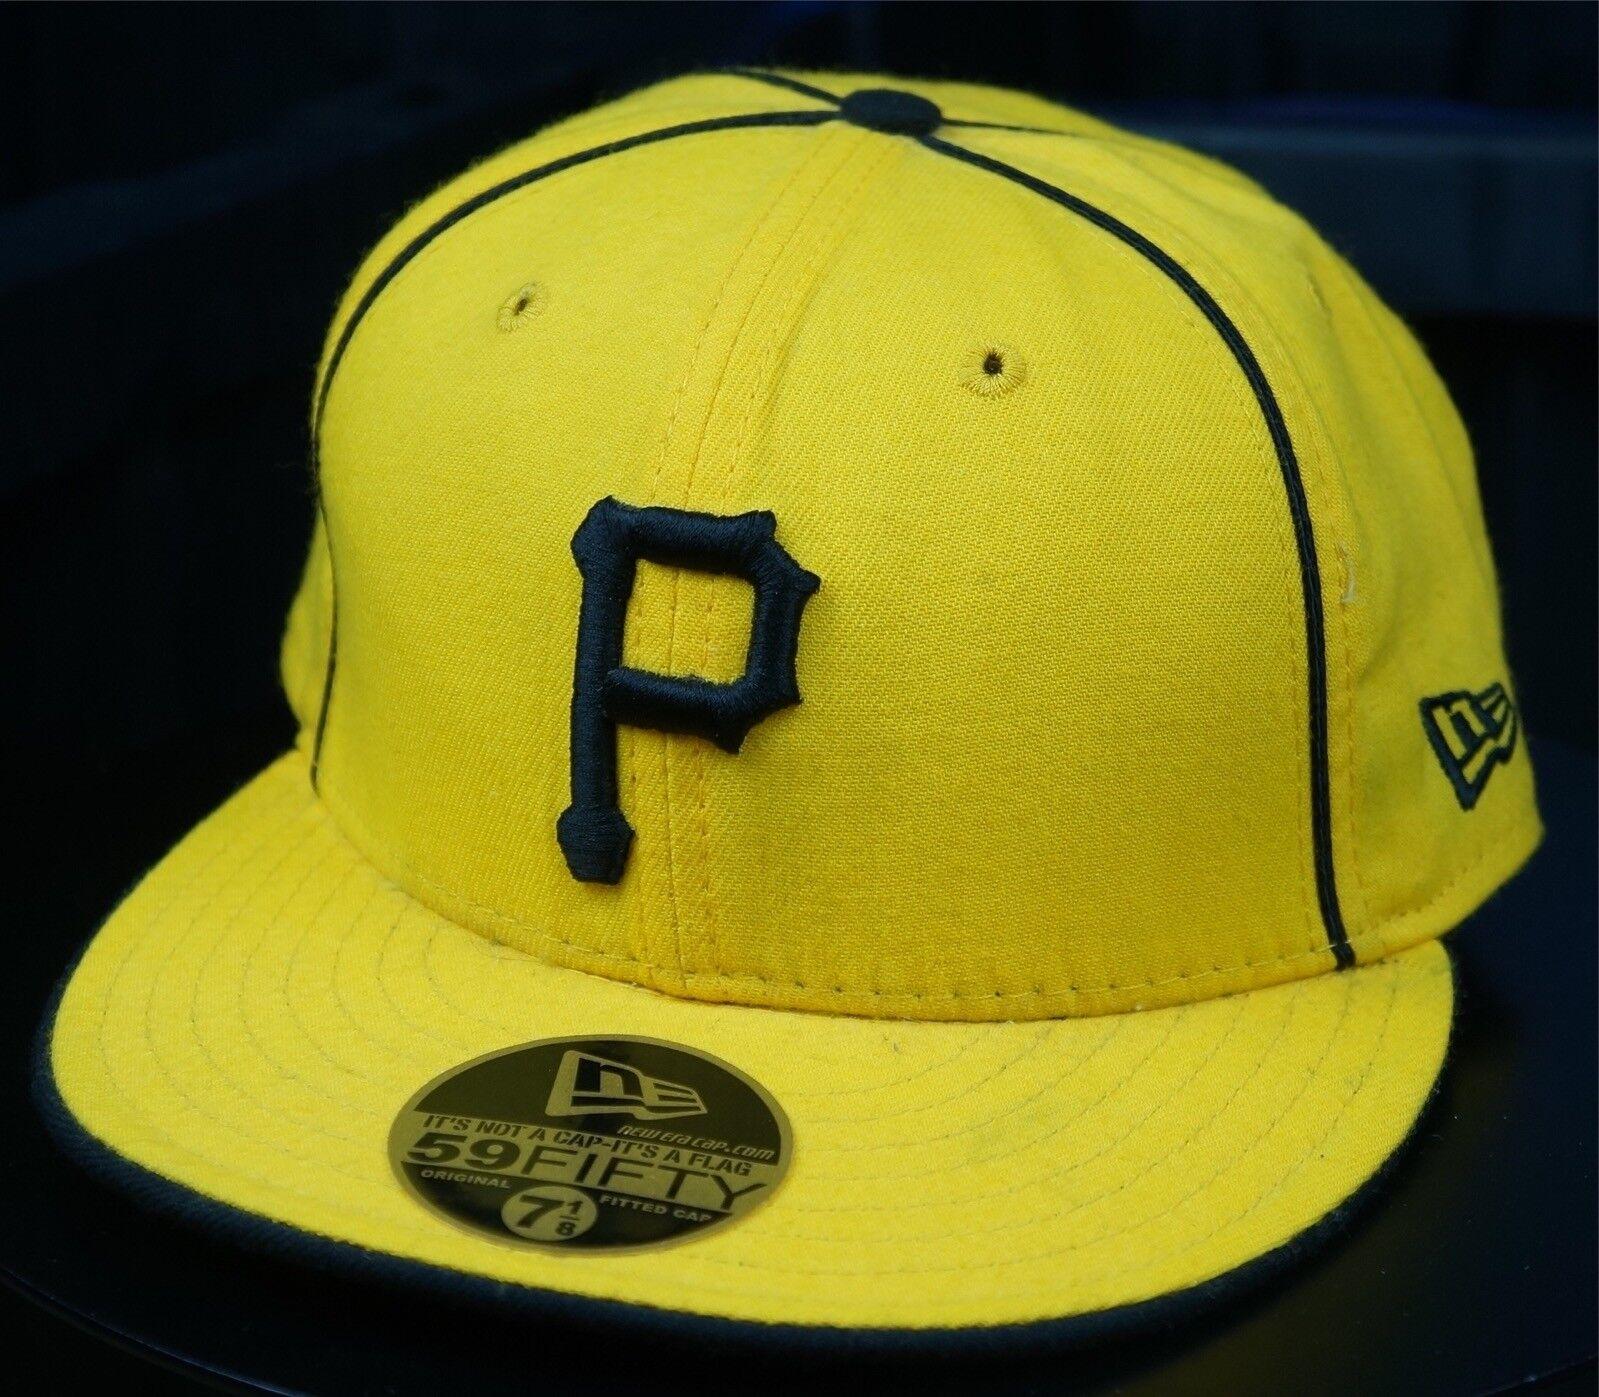 Rare Vintage MLB NEW ERA Pittsburgh Pirates MLB Vintage Fitted Hat Cap 90s Yellow SZ 7 1/8 0546ff